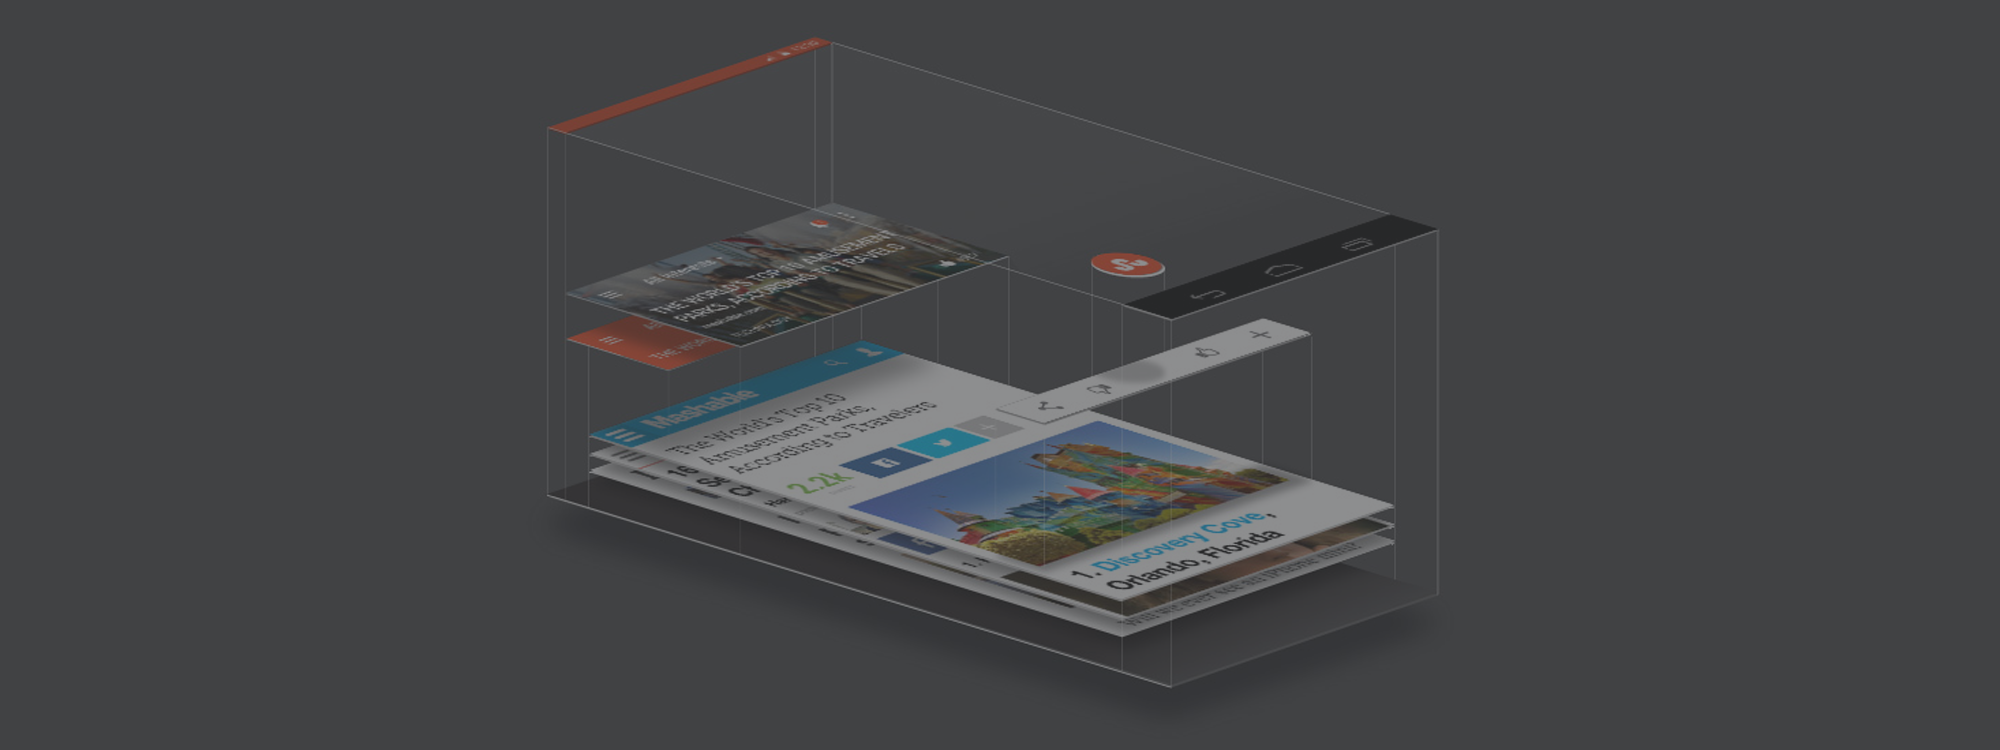 Designing mobile apps for cross-platform continuity